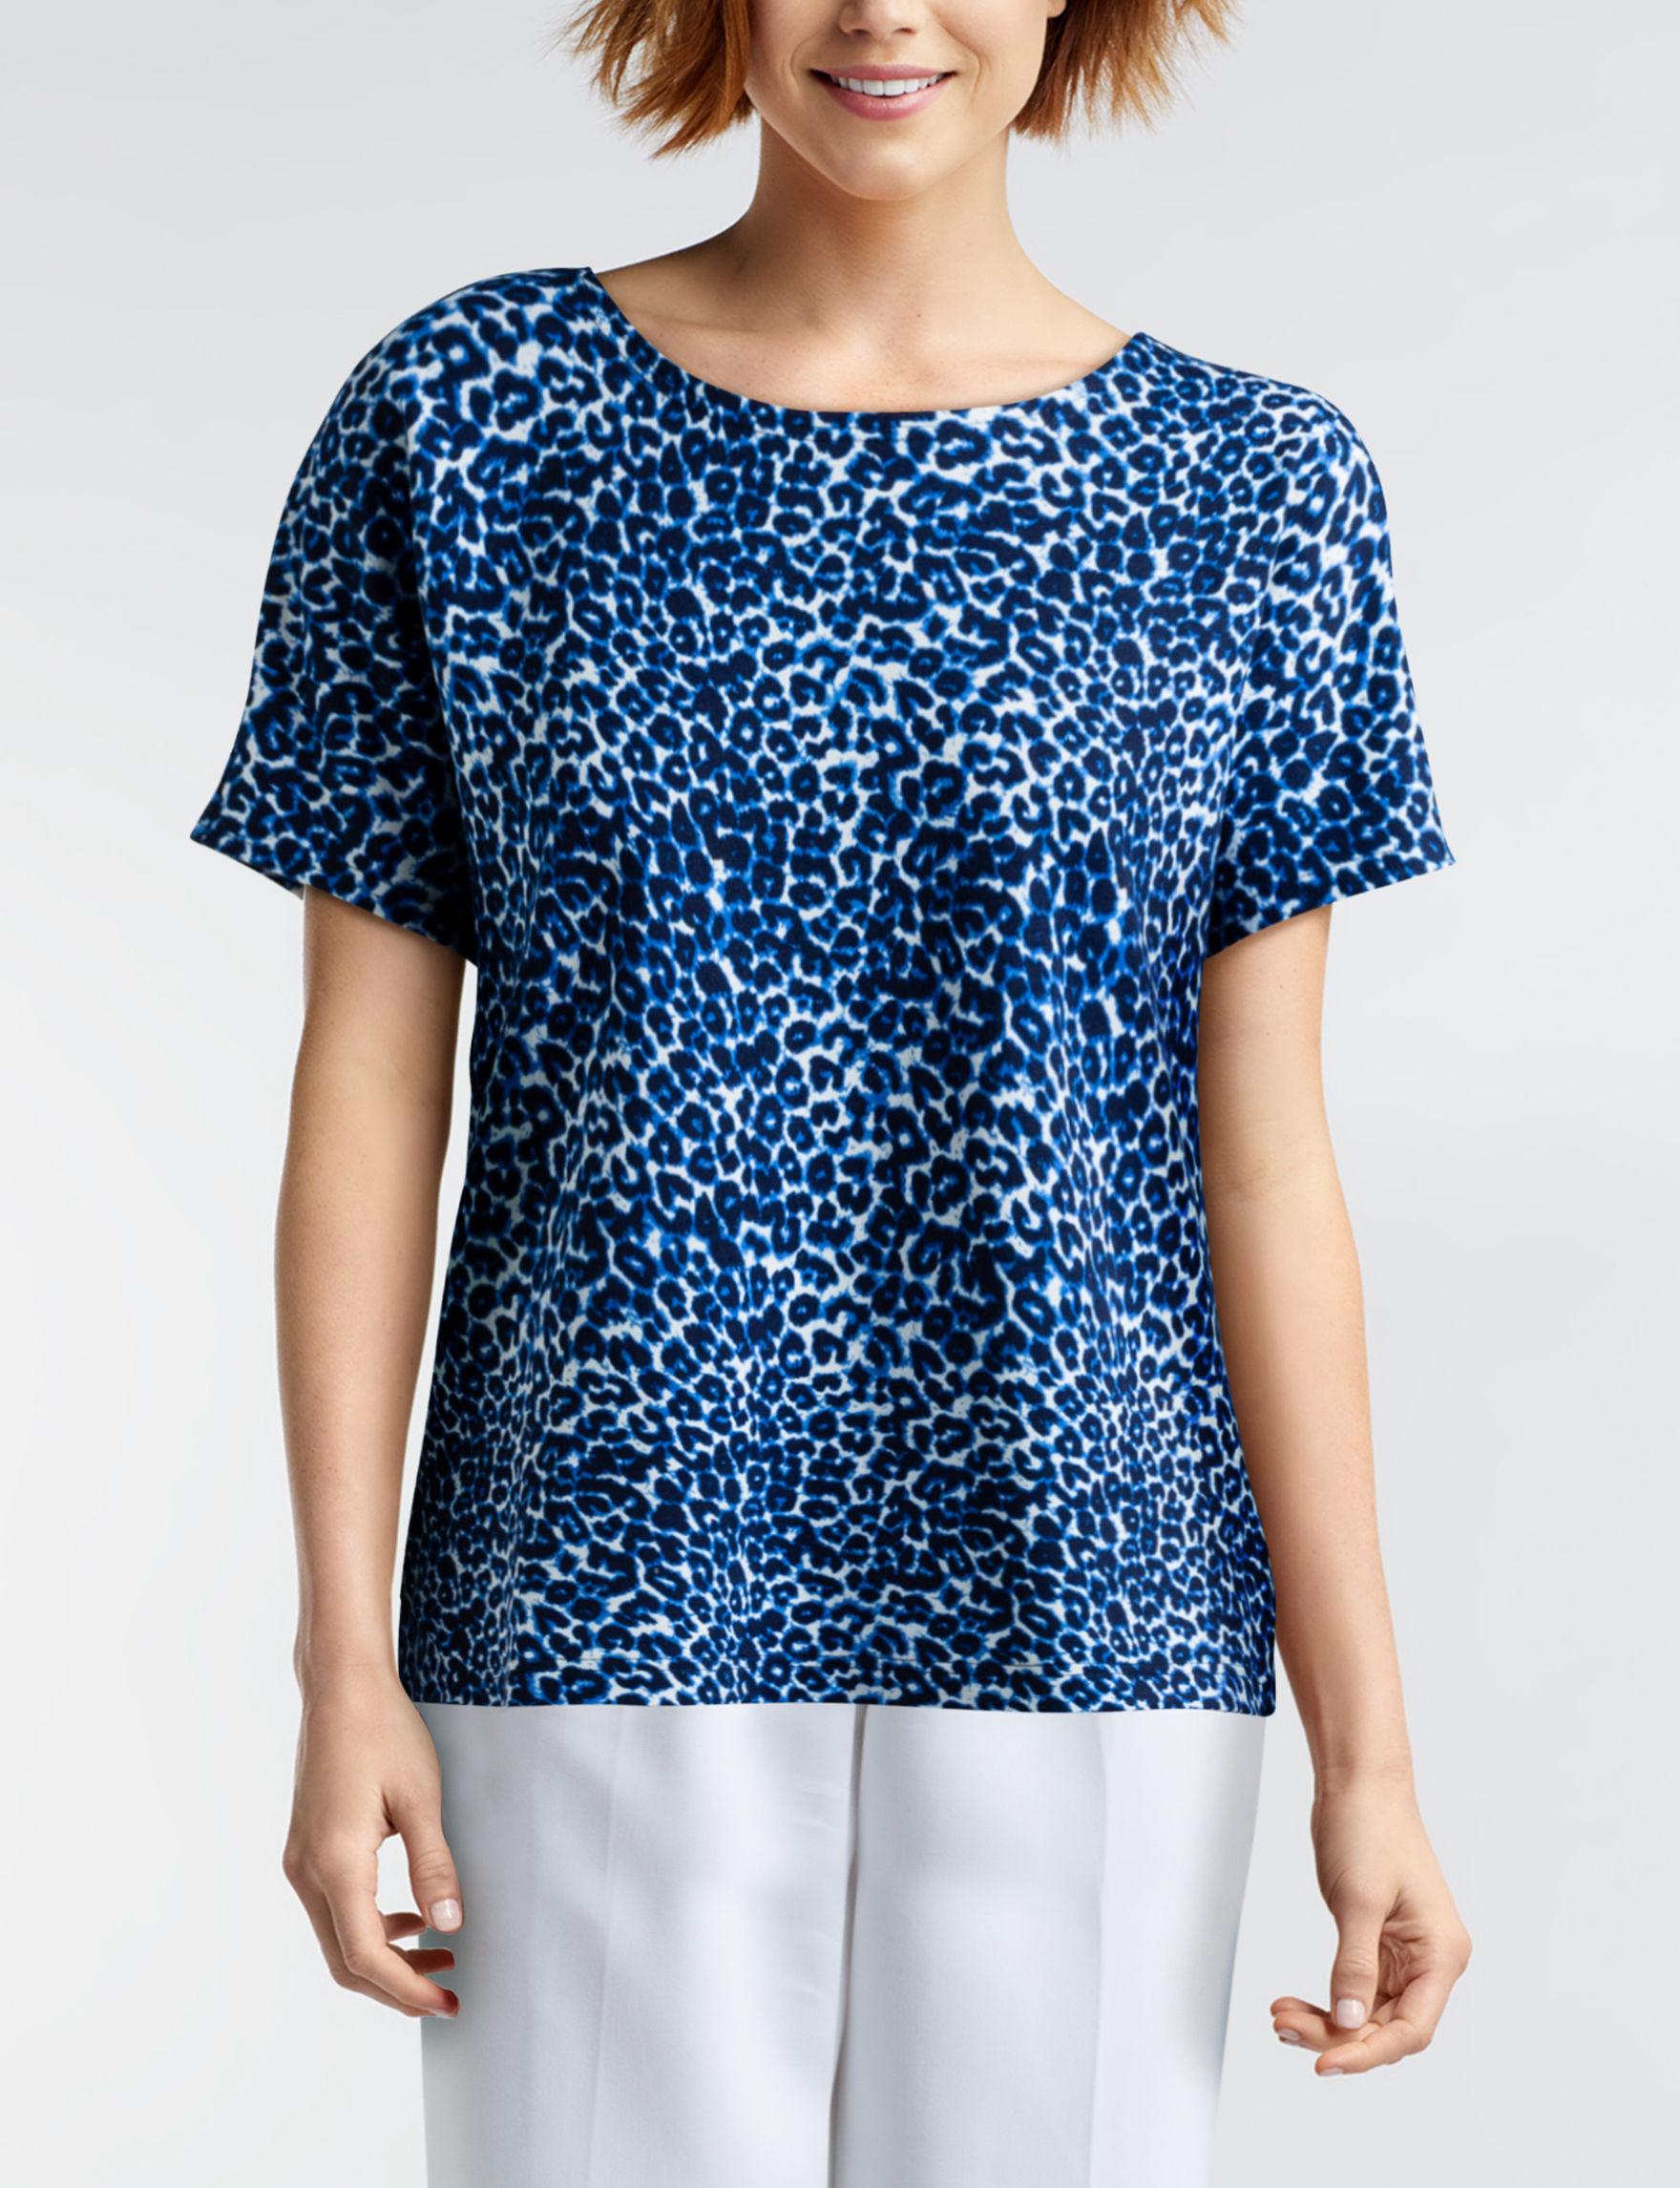 Cathy Daniels Leopard Shirts & Blouses